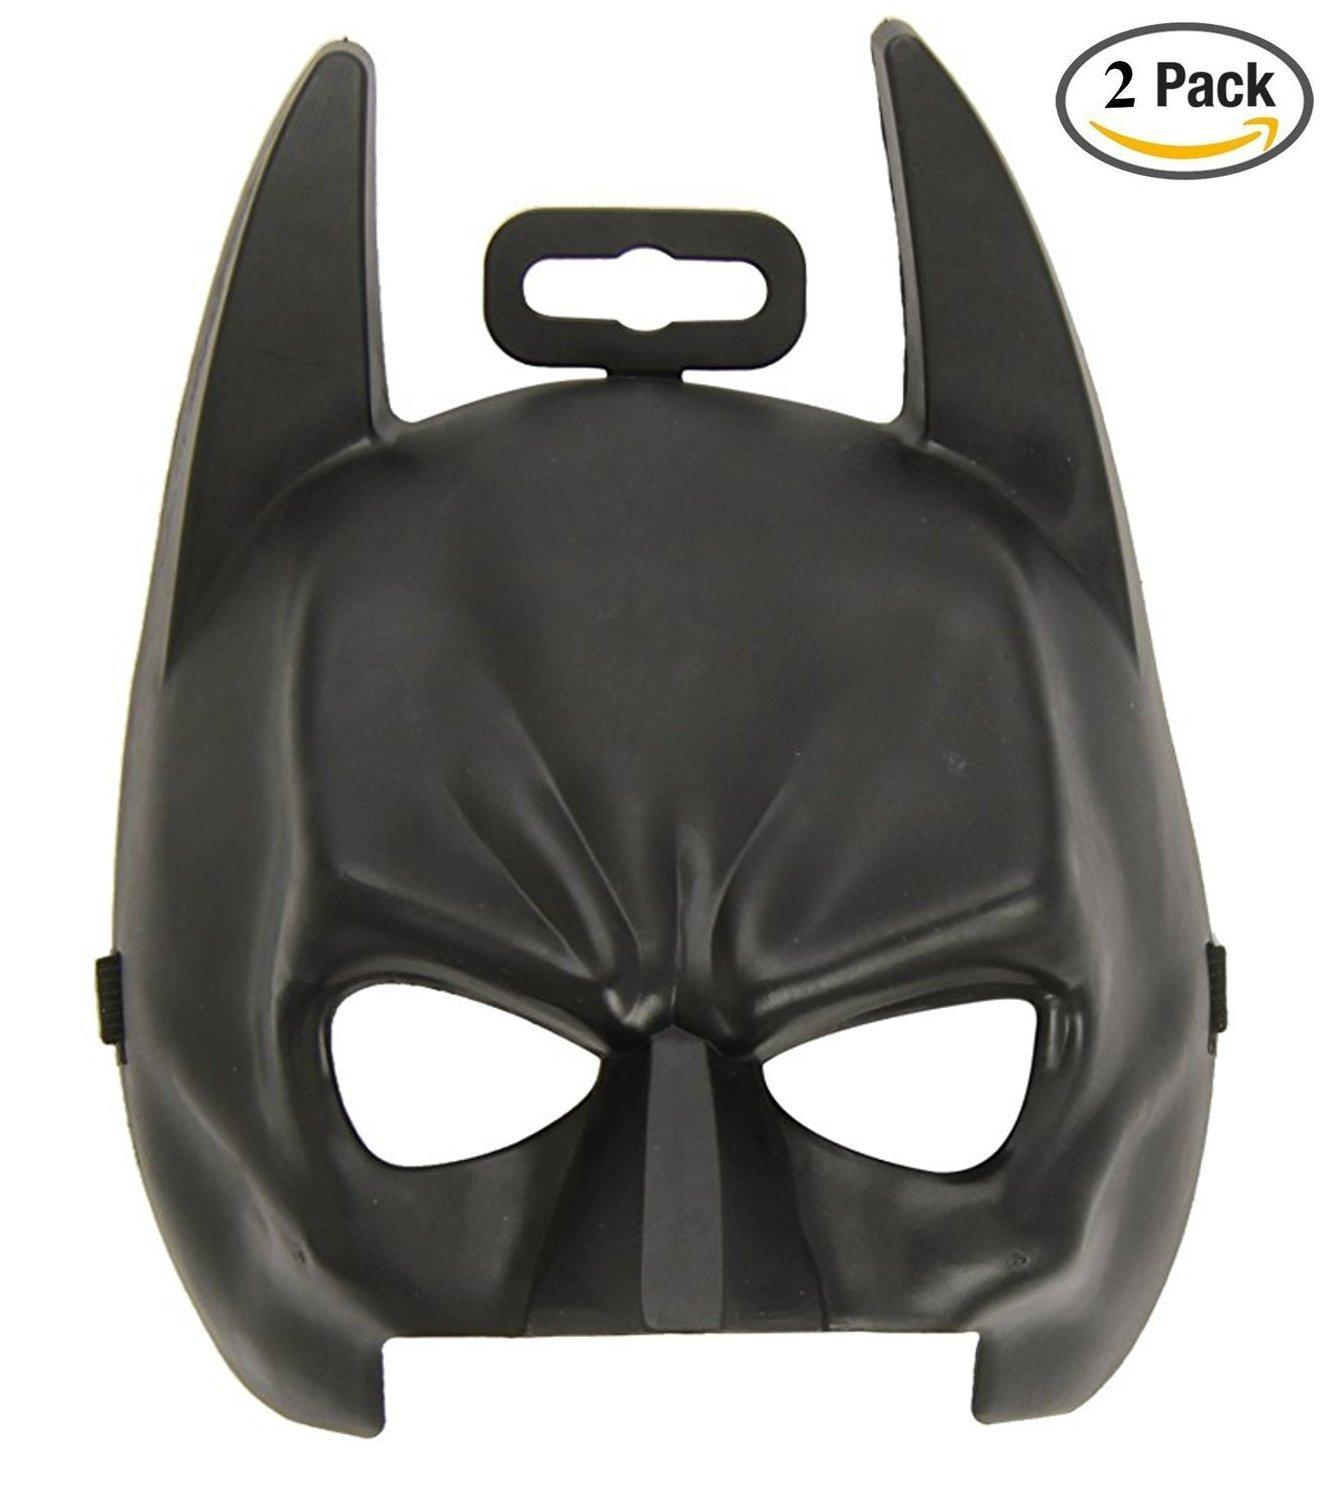 Batman Costume Mask Child (Two Pack)